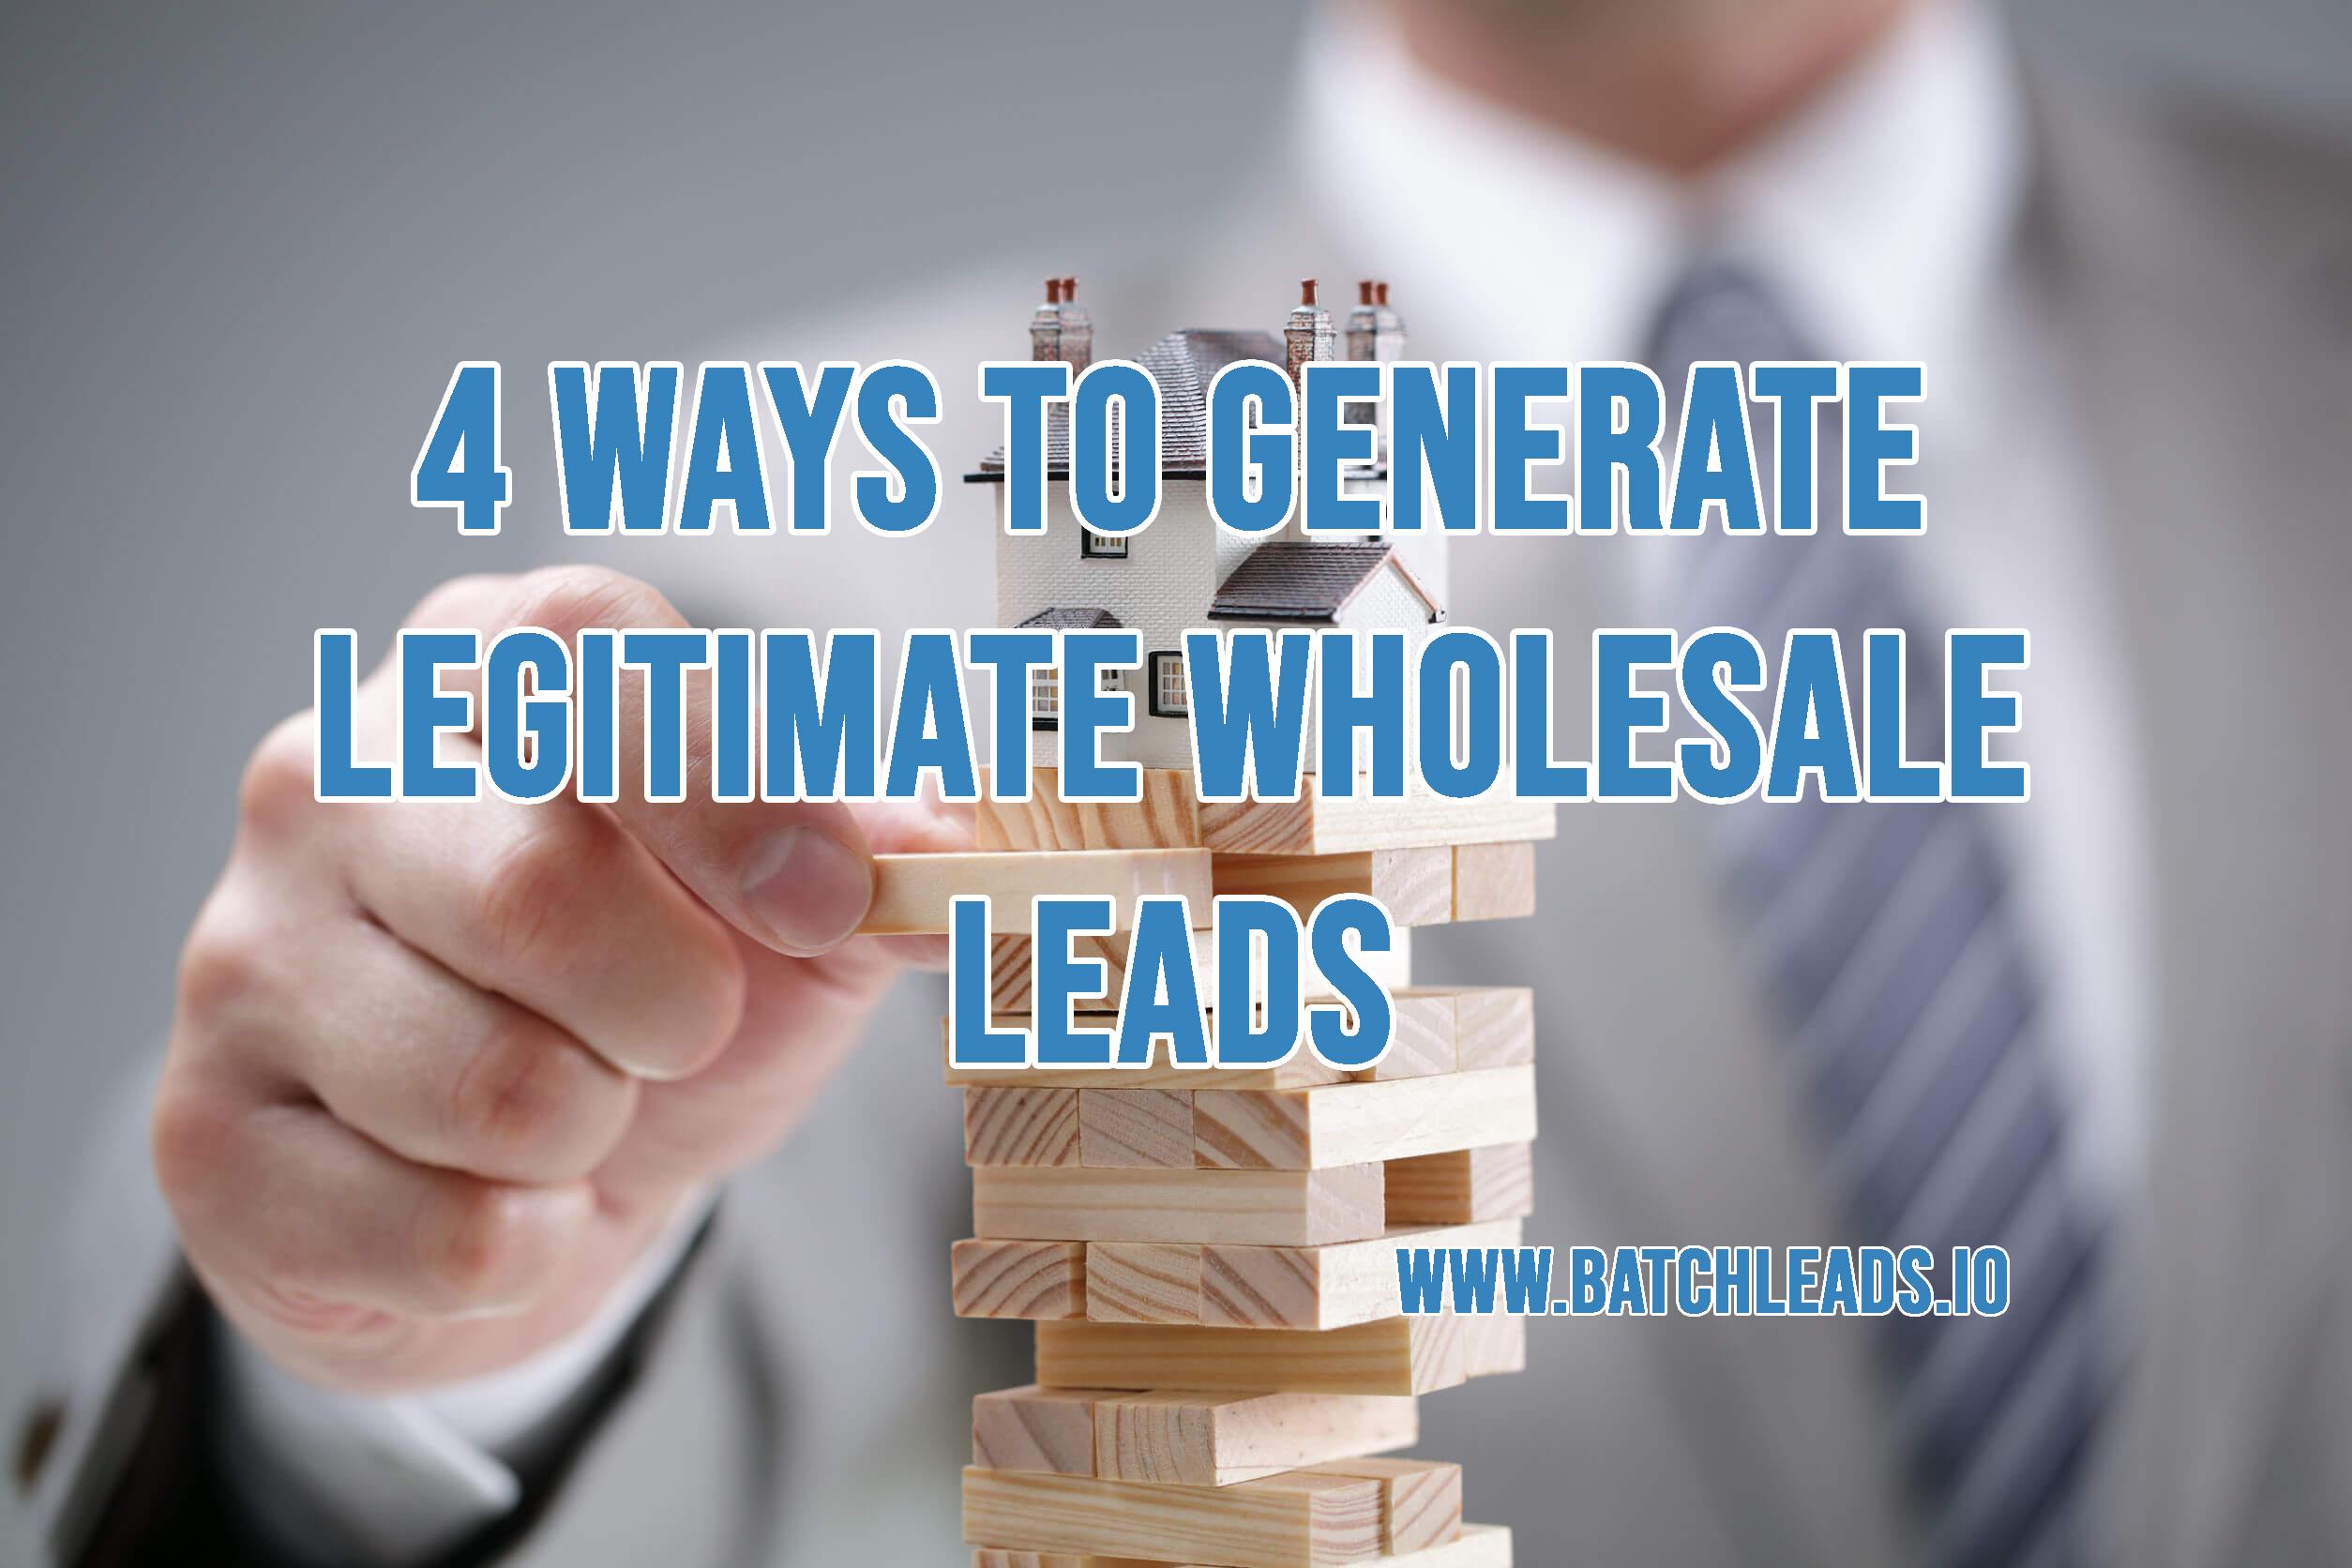 4 Ways To Generate Legitimate Wholesale Leads